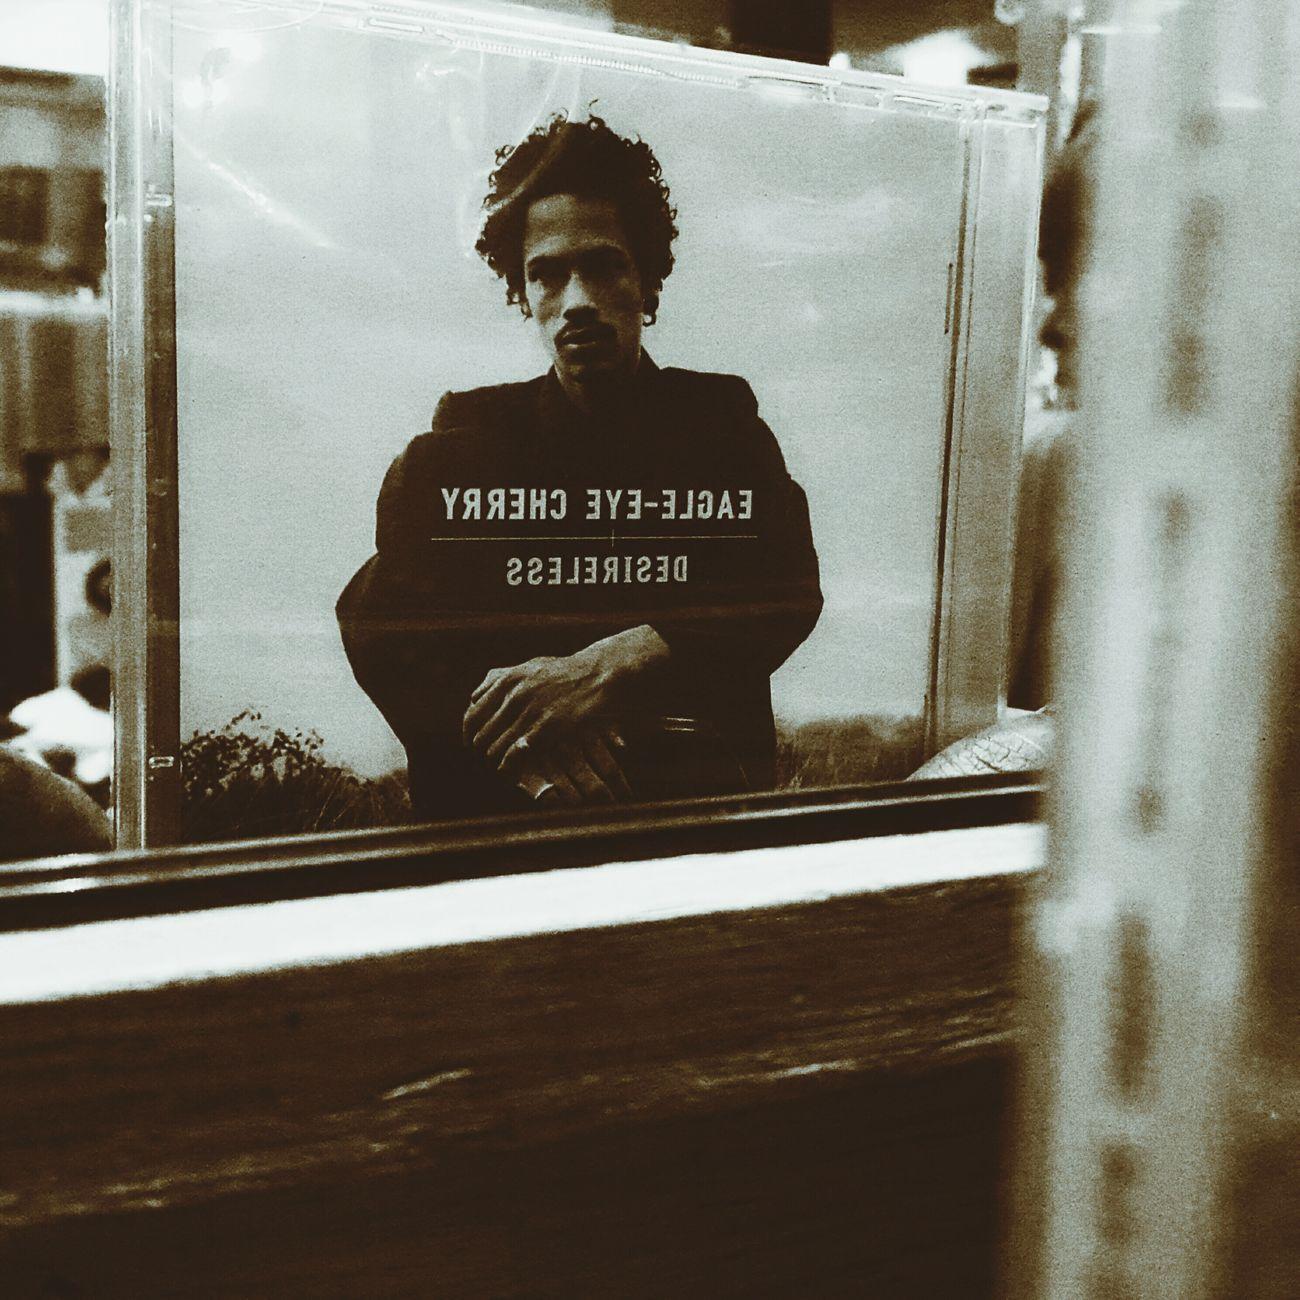 Poundshop buys, Eagle-Eye Cherry - Desireless Mirror Musician CDs Photography Folk Guitar Rock Music Image One Person Portrait